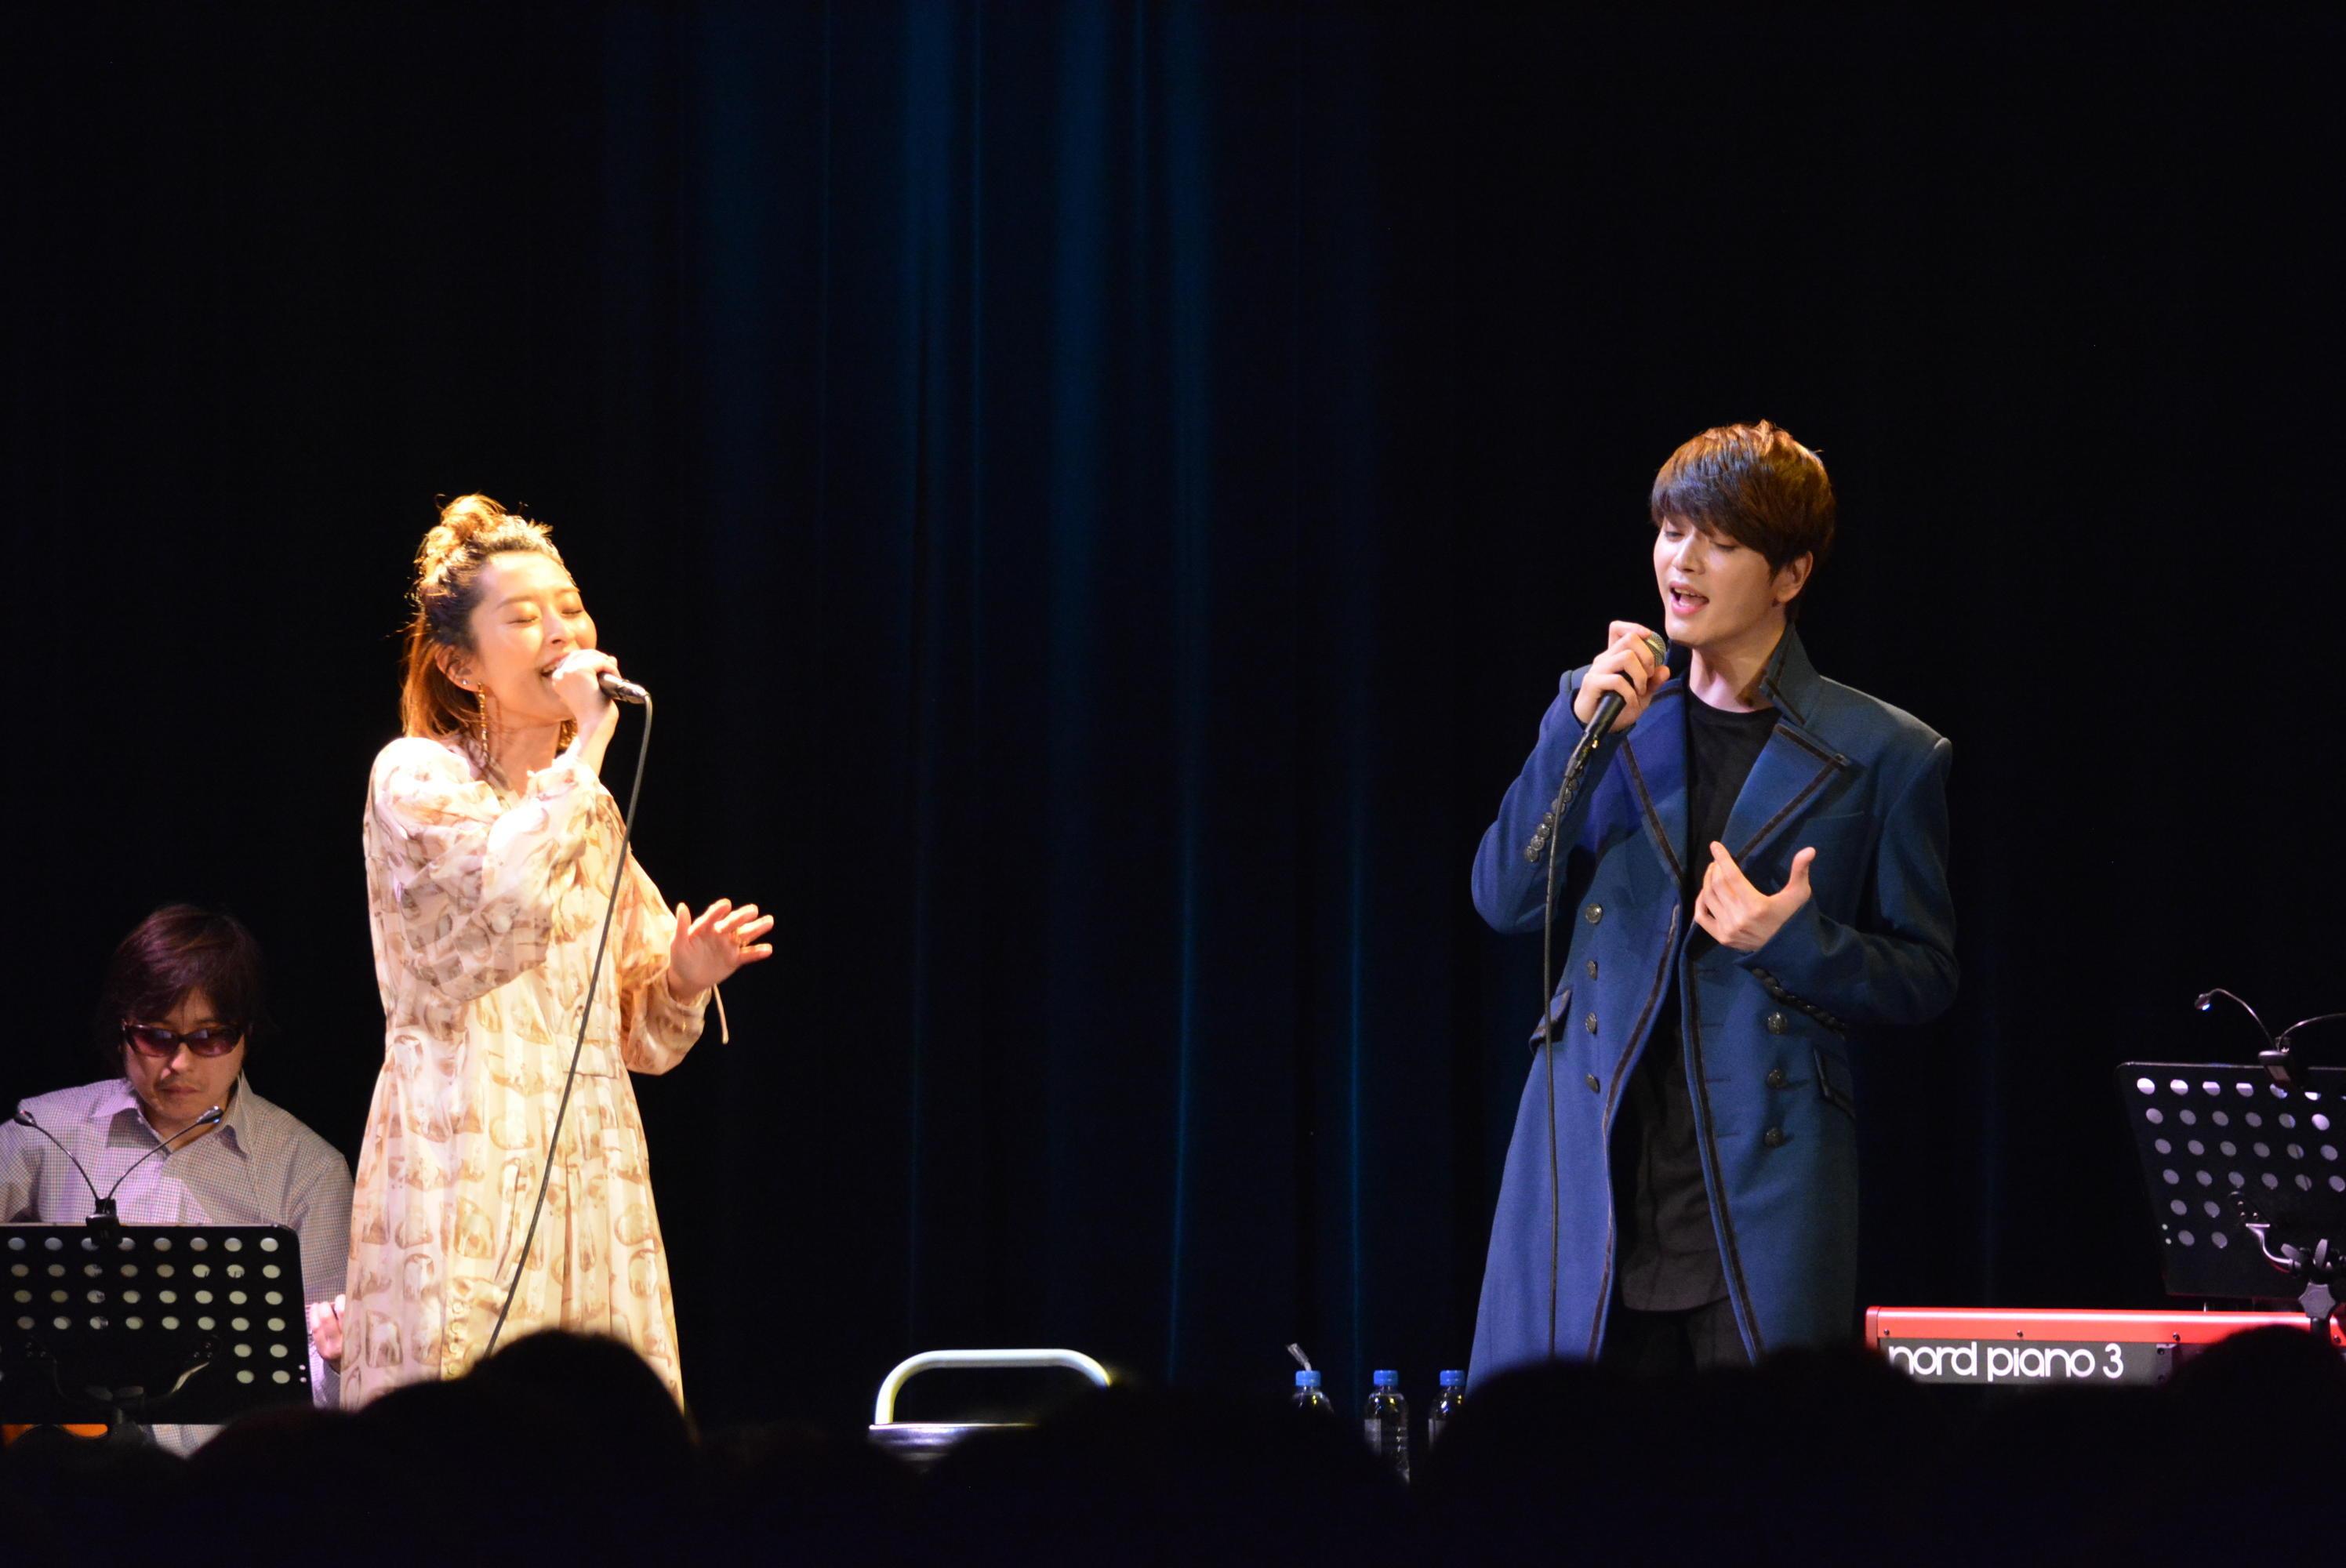 http://news.yoshimoto.co.jp/20180330160422-375a4b839e4e1011cdc3ddb23f99c0c01277c7ef.jpg